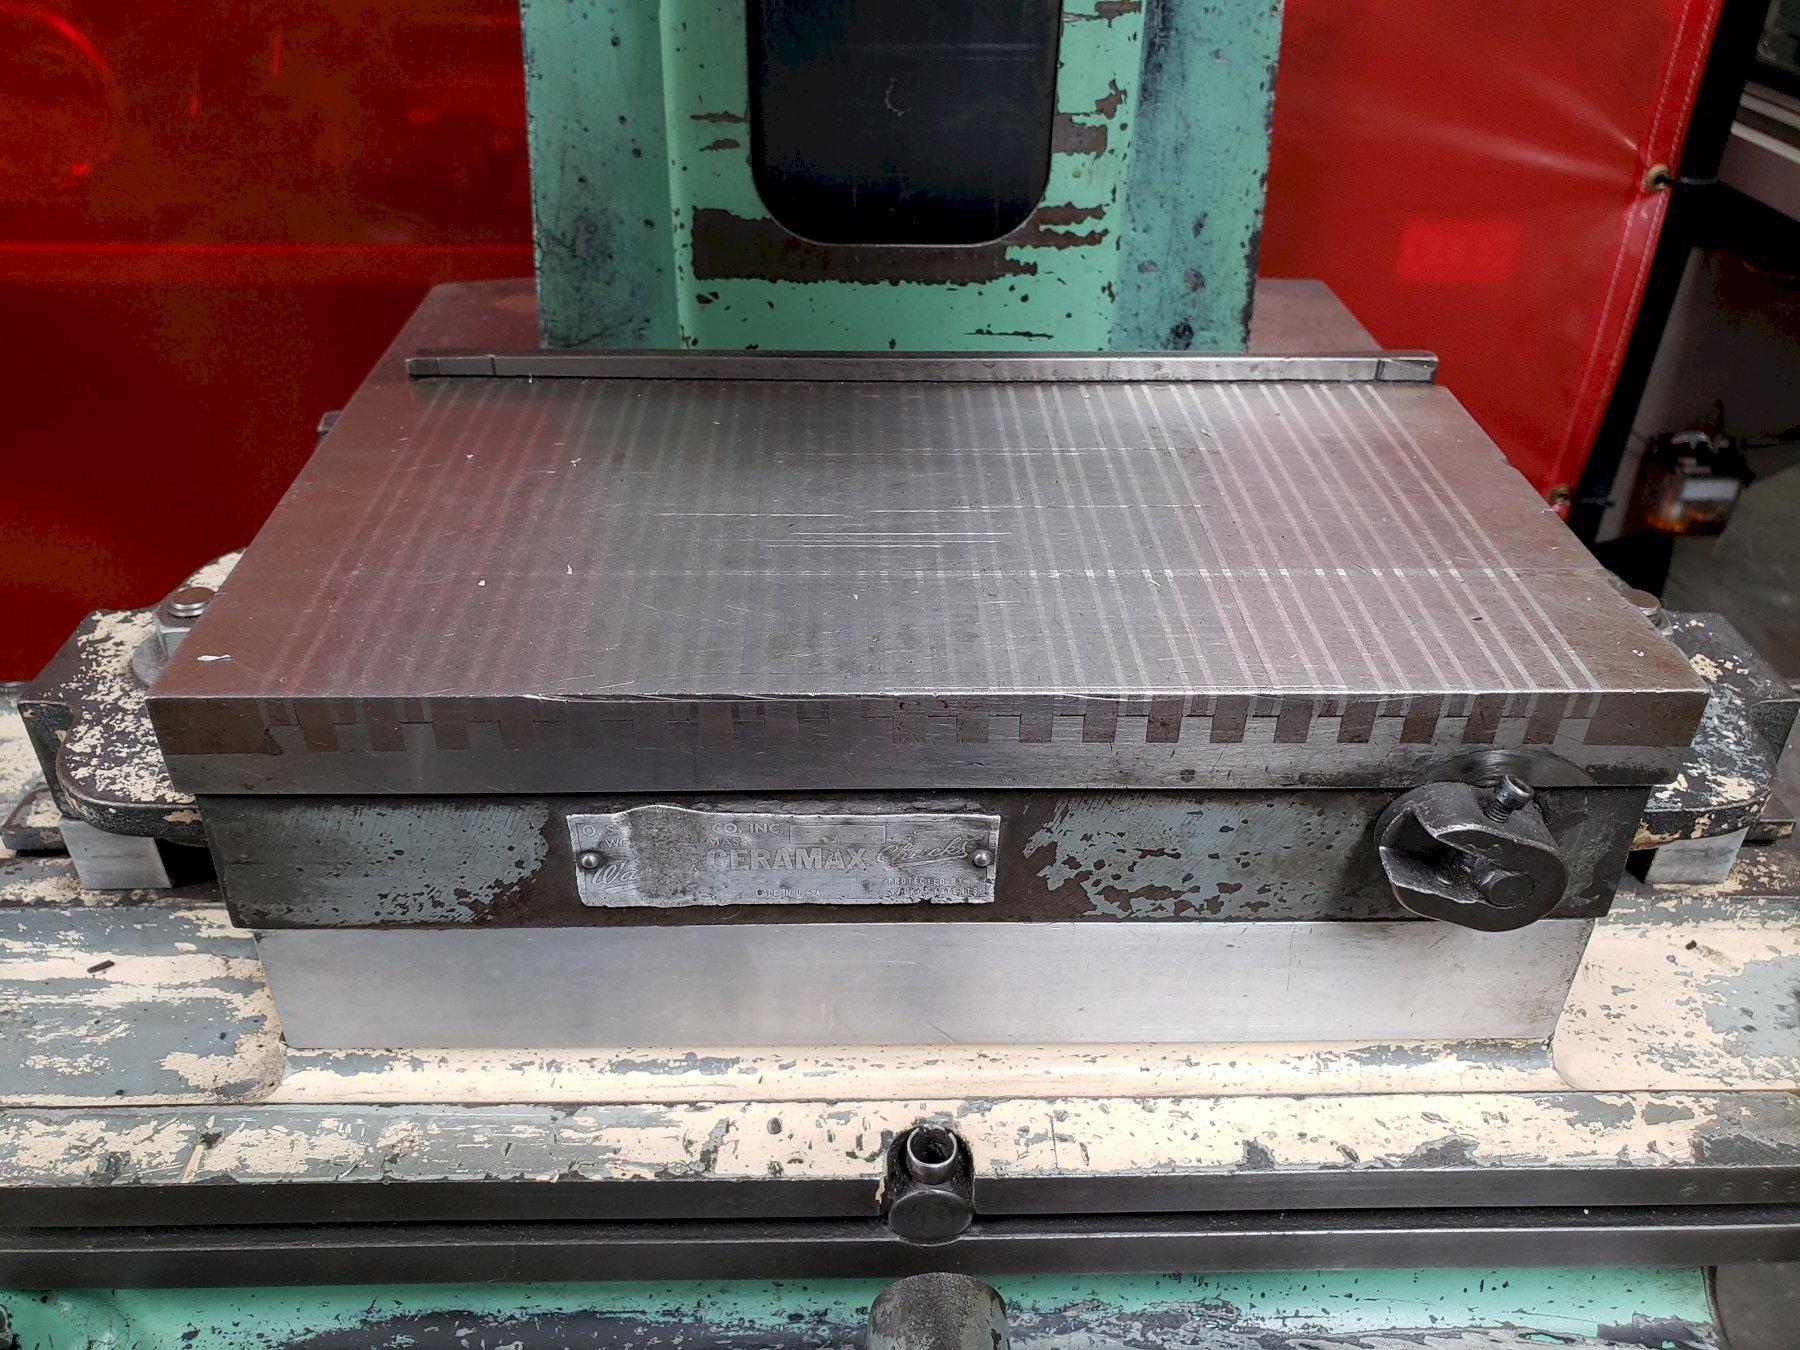 Boyar Schultz 612 Surface Grinder with Ceramax Magnetic Chuck